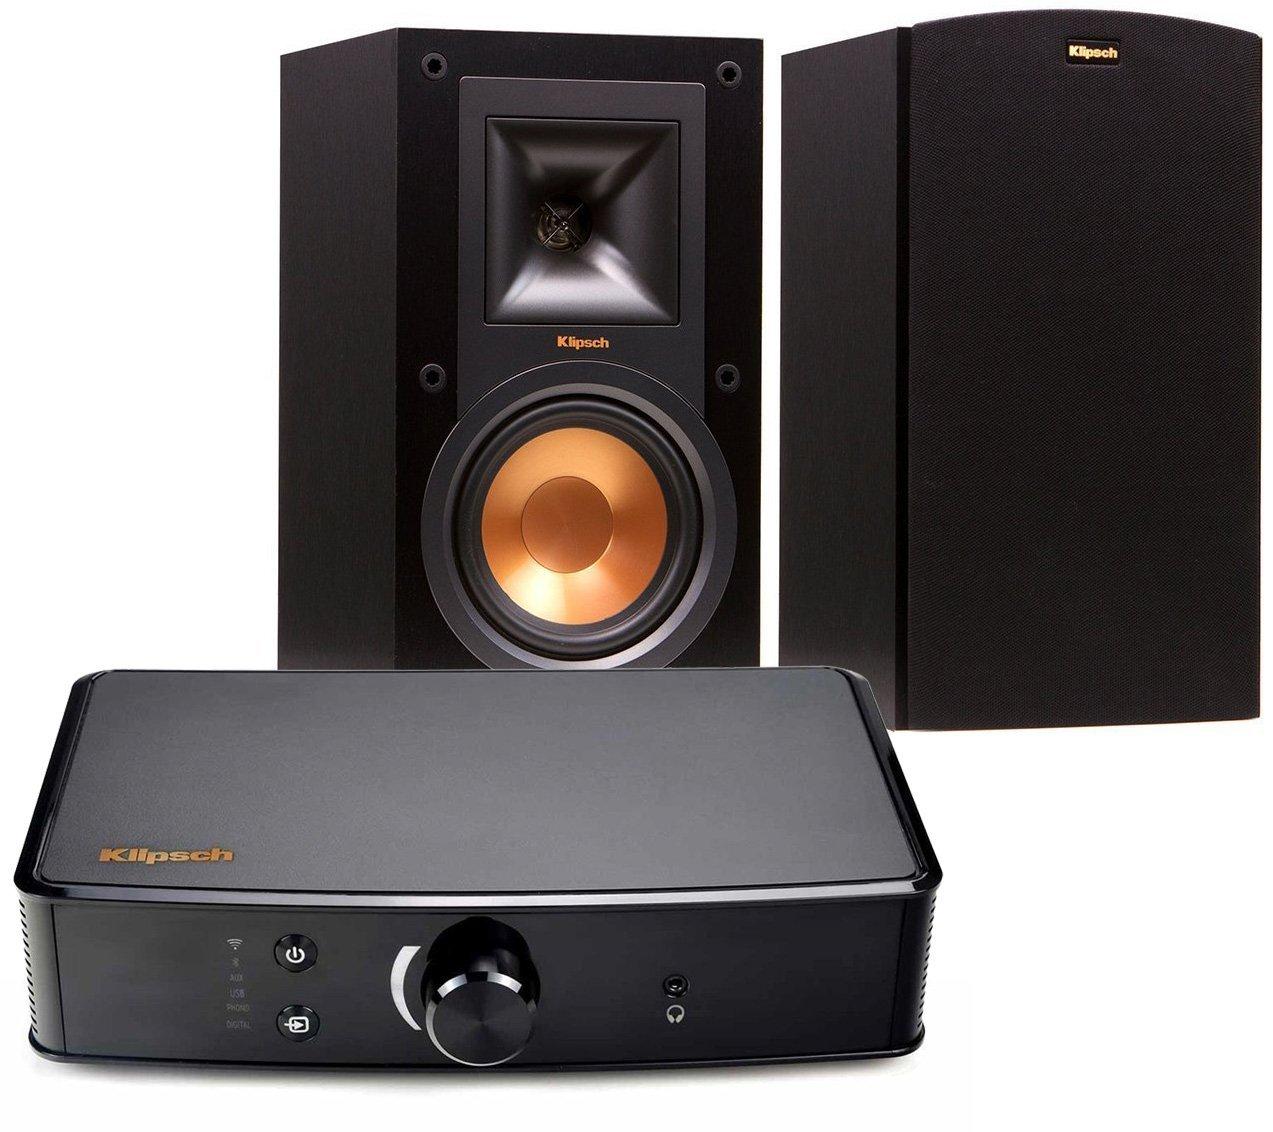 Klipsch R-15M Bookshelf Speakers and Powergate Amplifier Bundle, Black $379.99